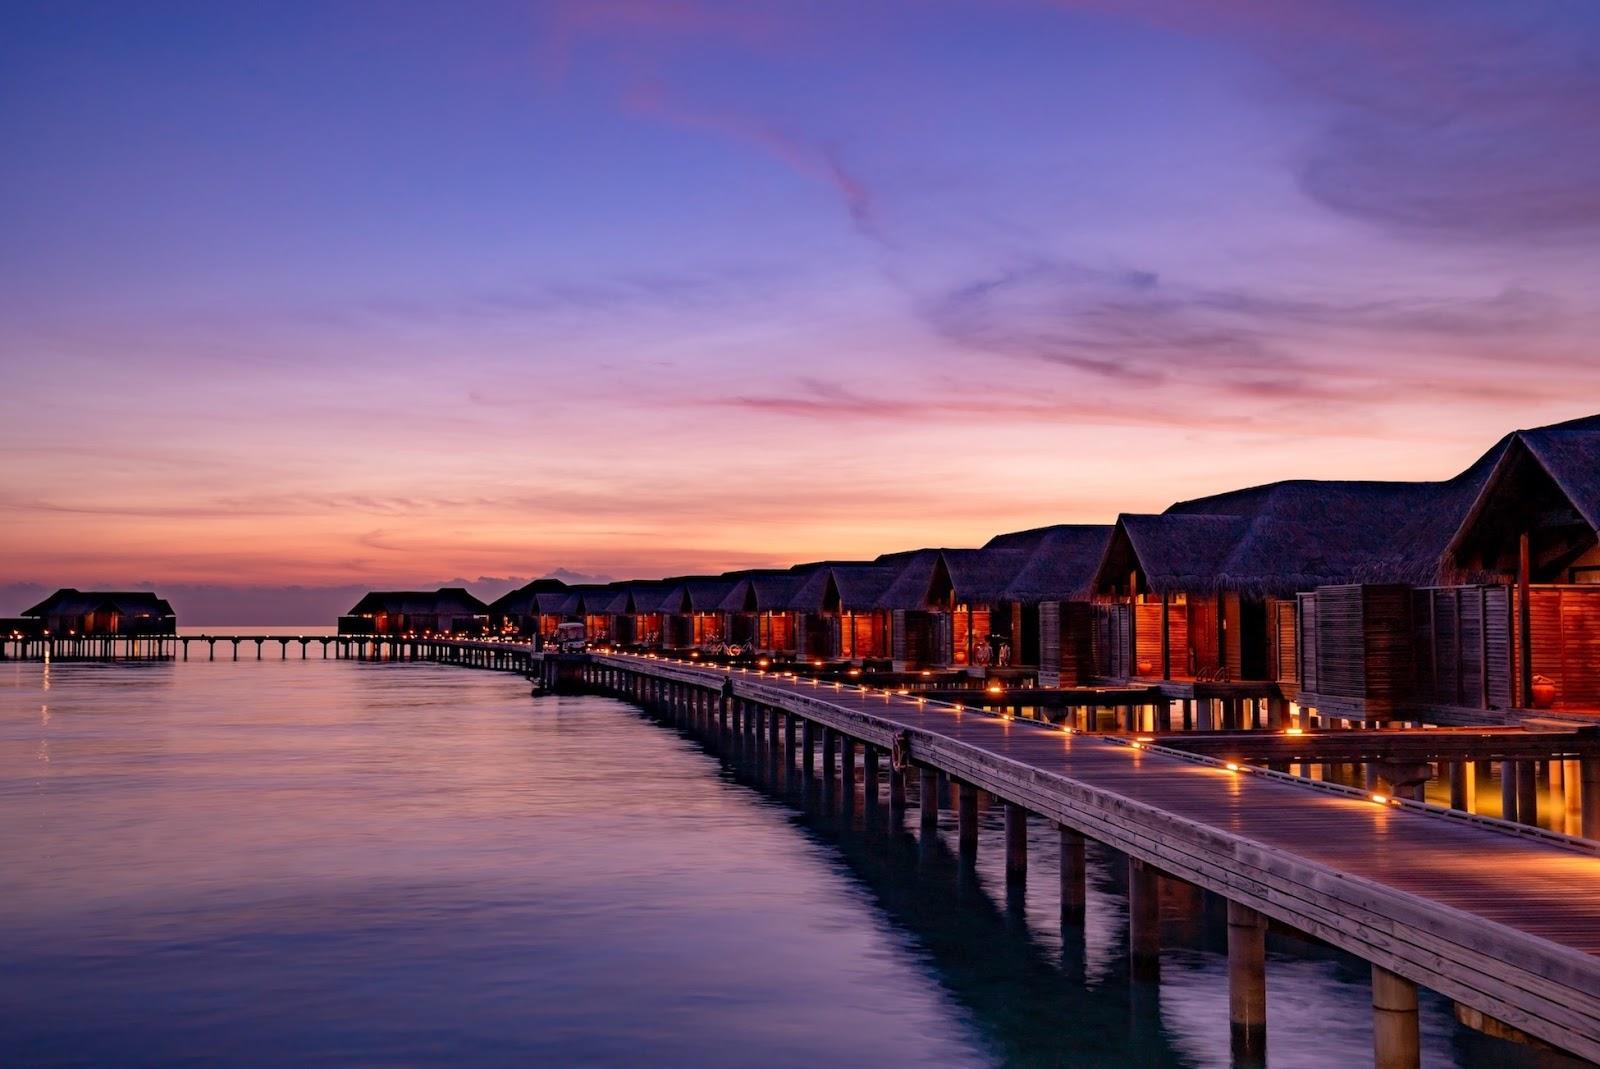 Minor Hotels เลือกใช้ SiteMinder Multi-Property ปรับตัวสร้างความสามารถในการแข่งขันที่ยั่งยืน